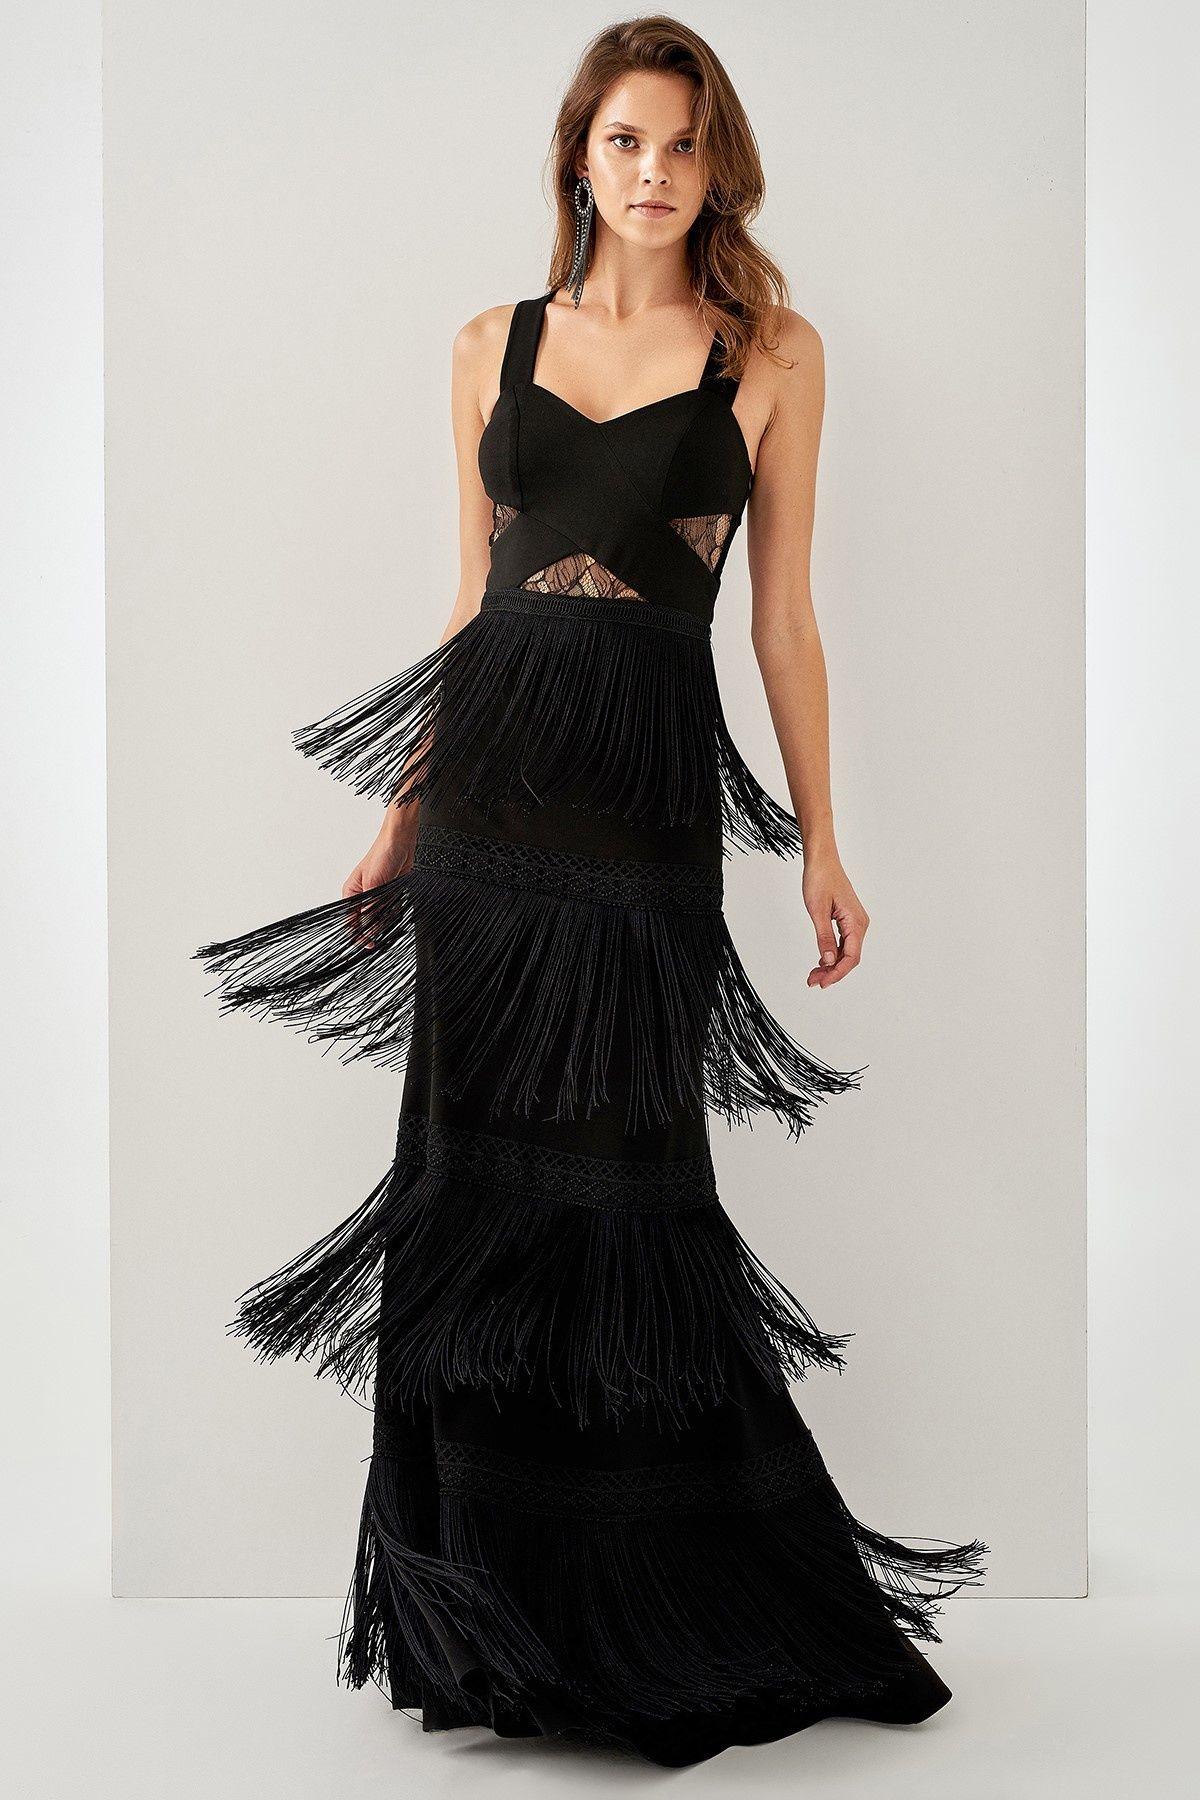 Trendyolmilla Siyah Puskullu Elbise Elbiseler Elbise Elbise Modelleri